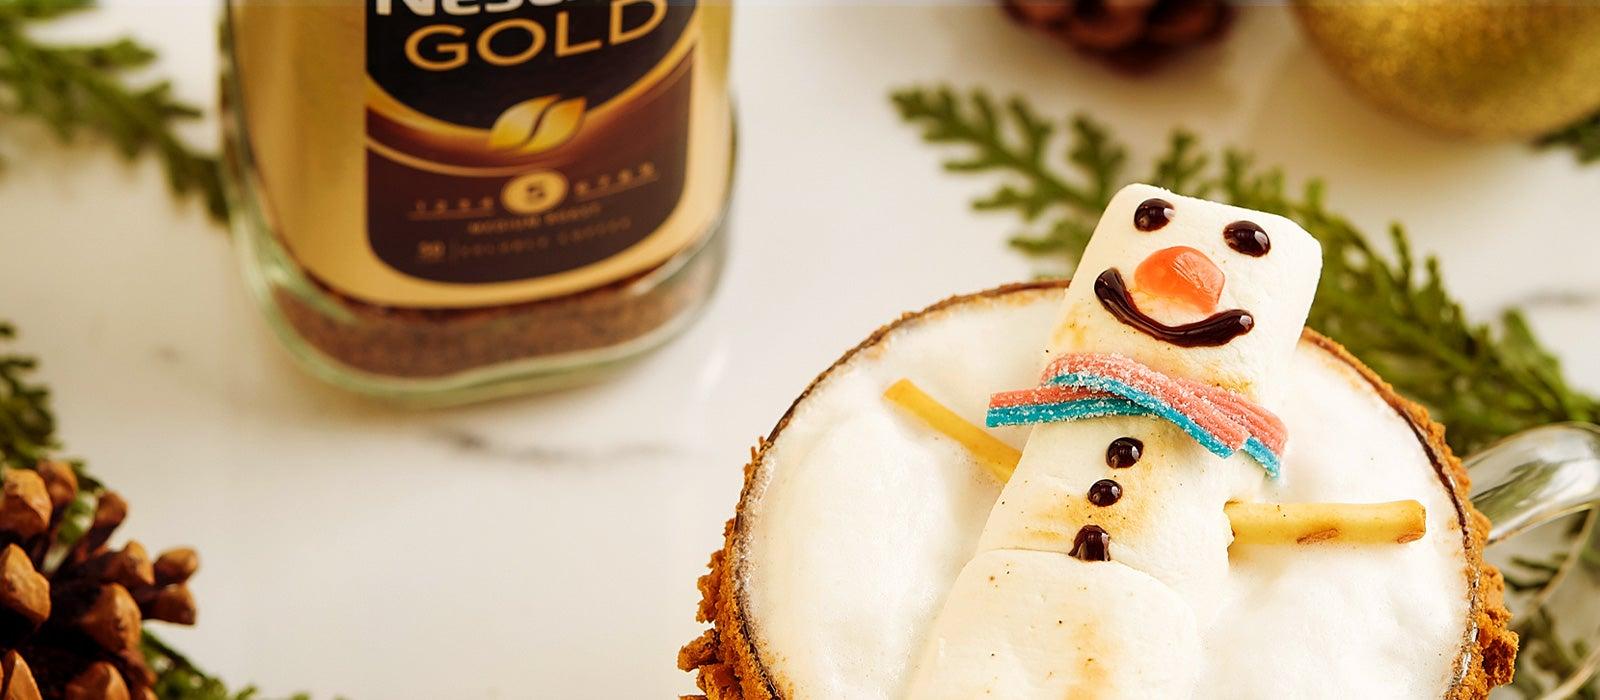 Nescafe Gold Toasted Marshmallow Recipe